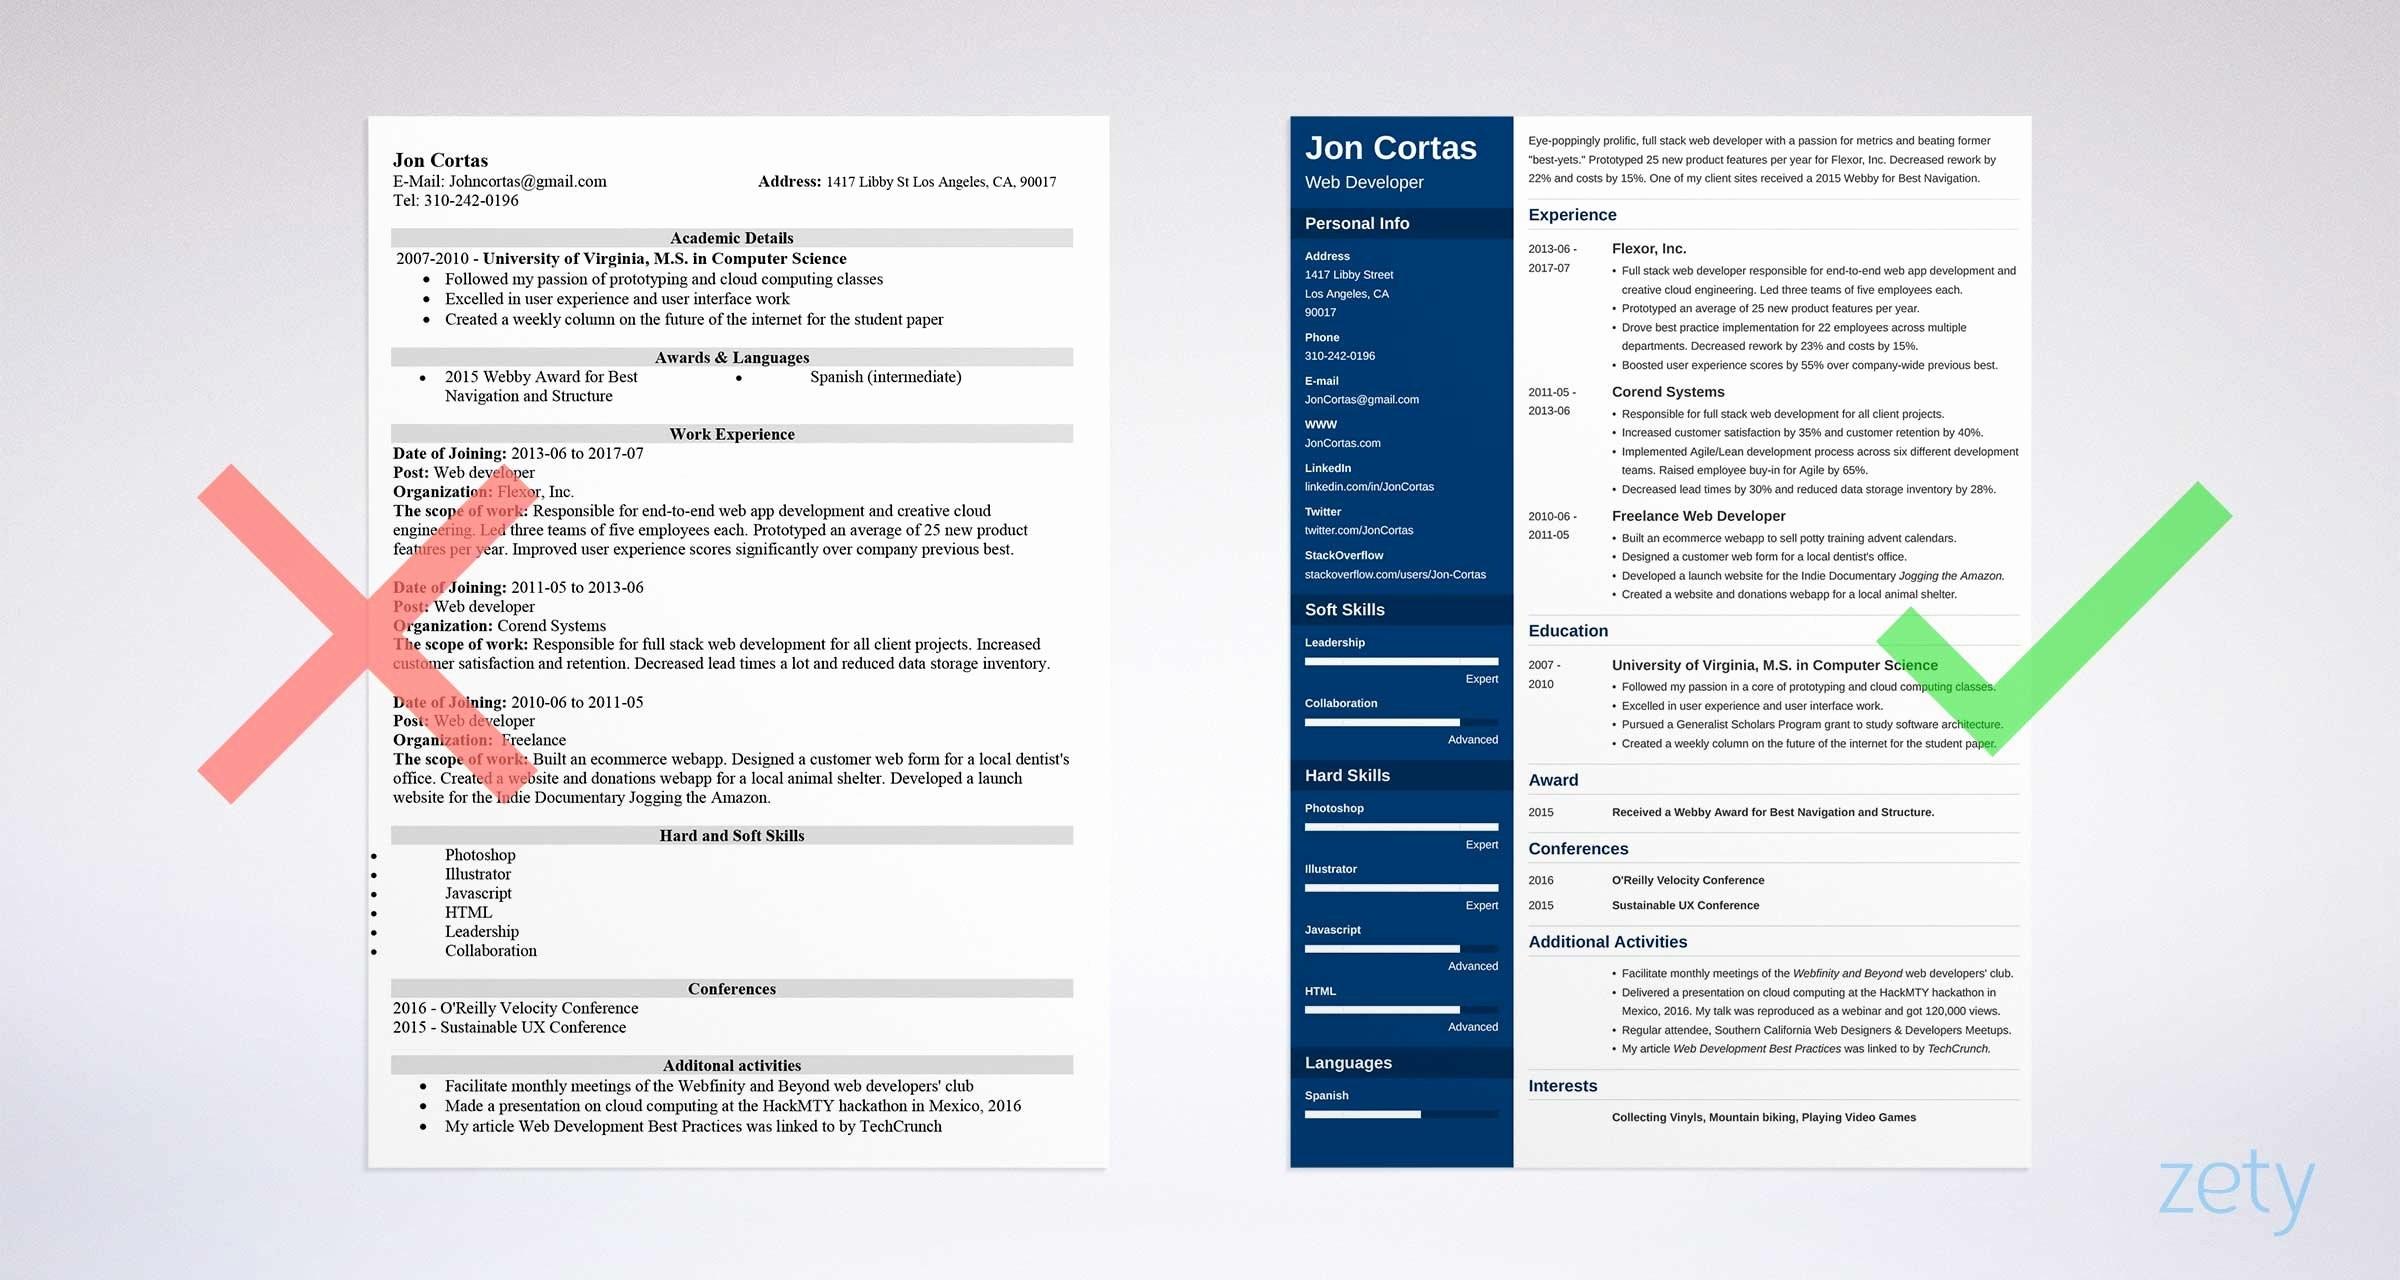 Free Word Resume Templates Download Beautiful Free Resume Templates for Word 15 Cv Resume formats to